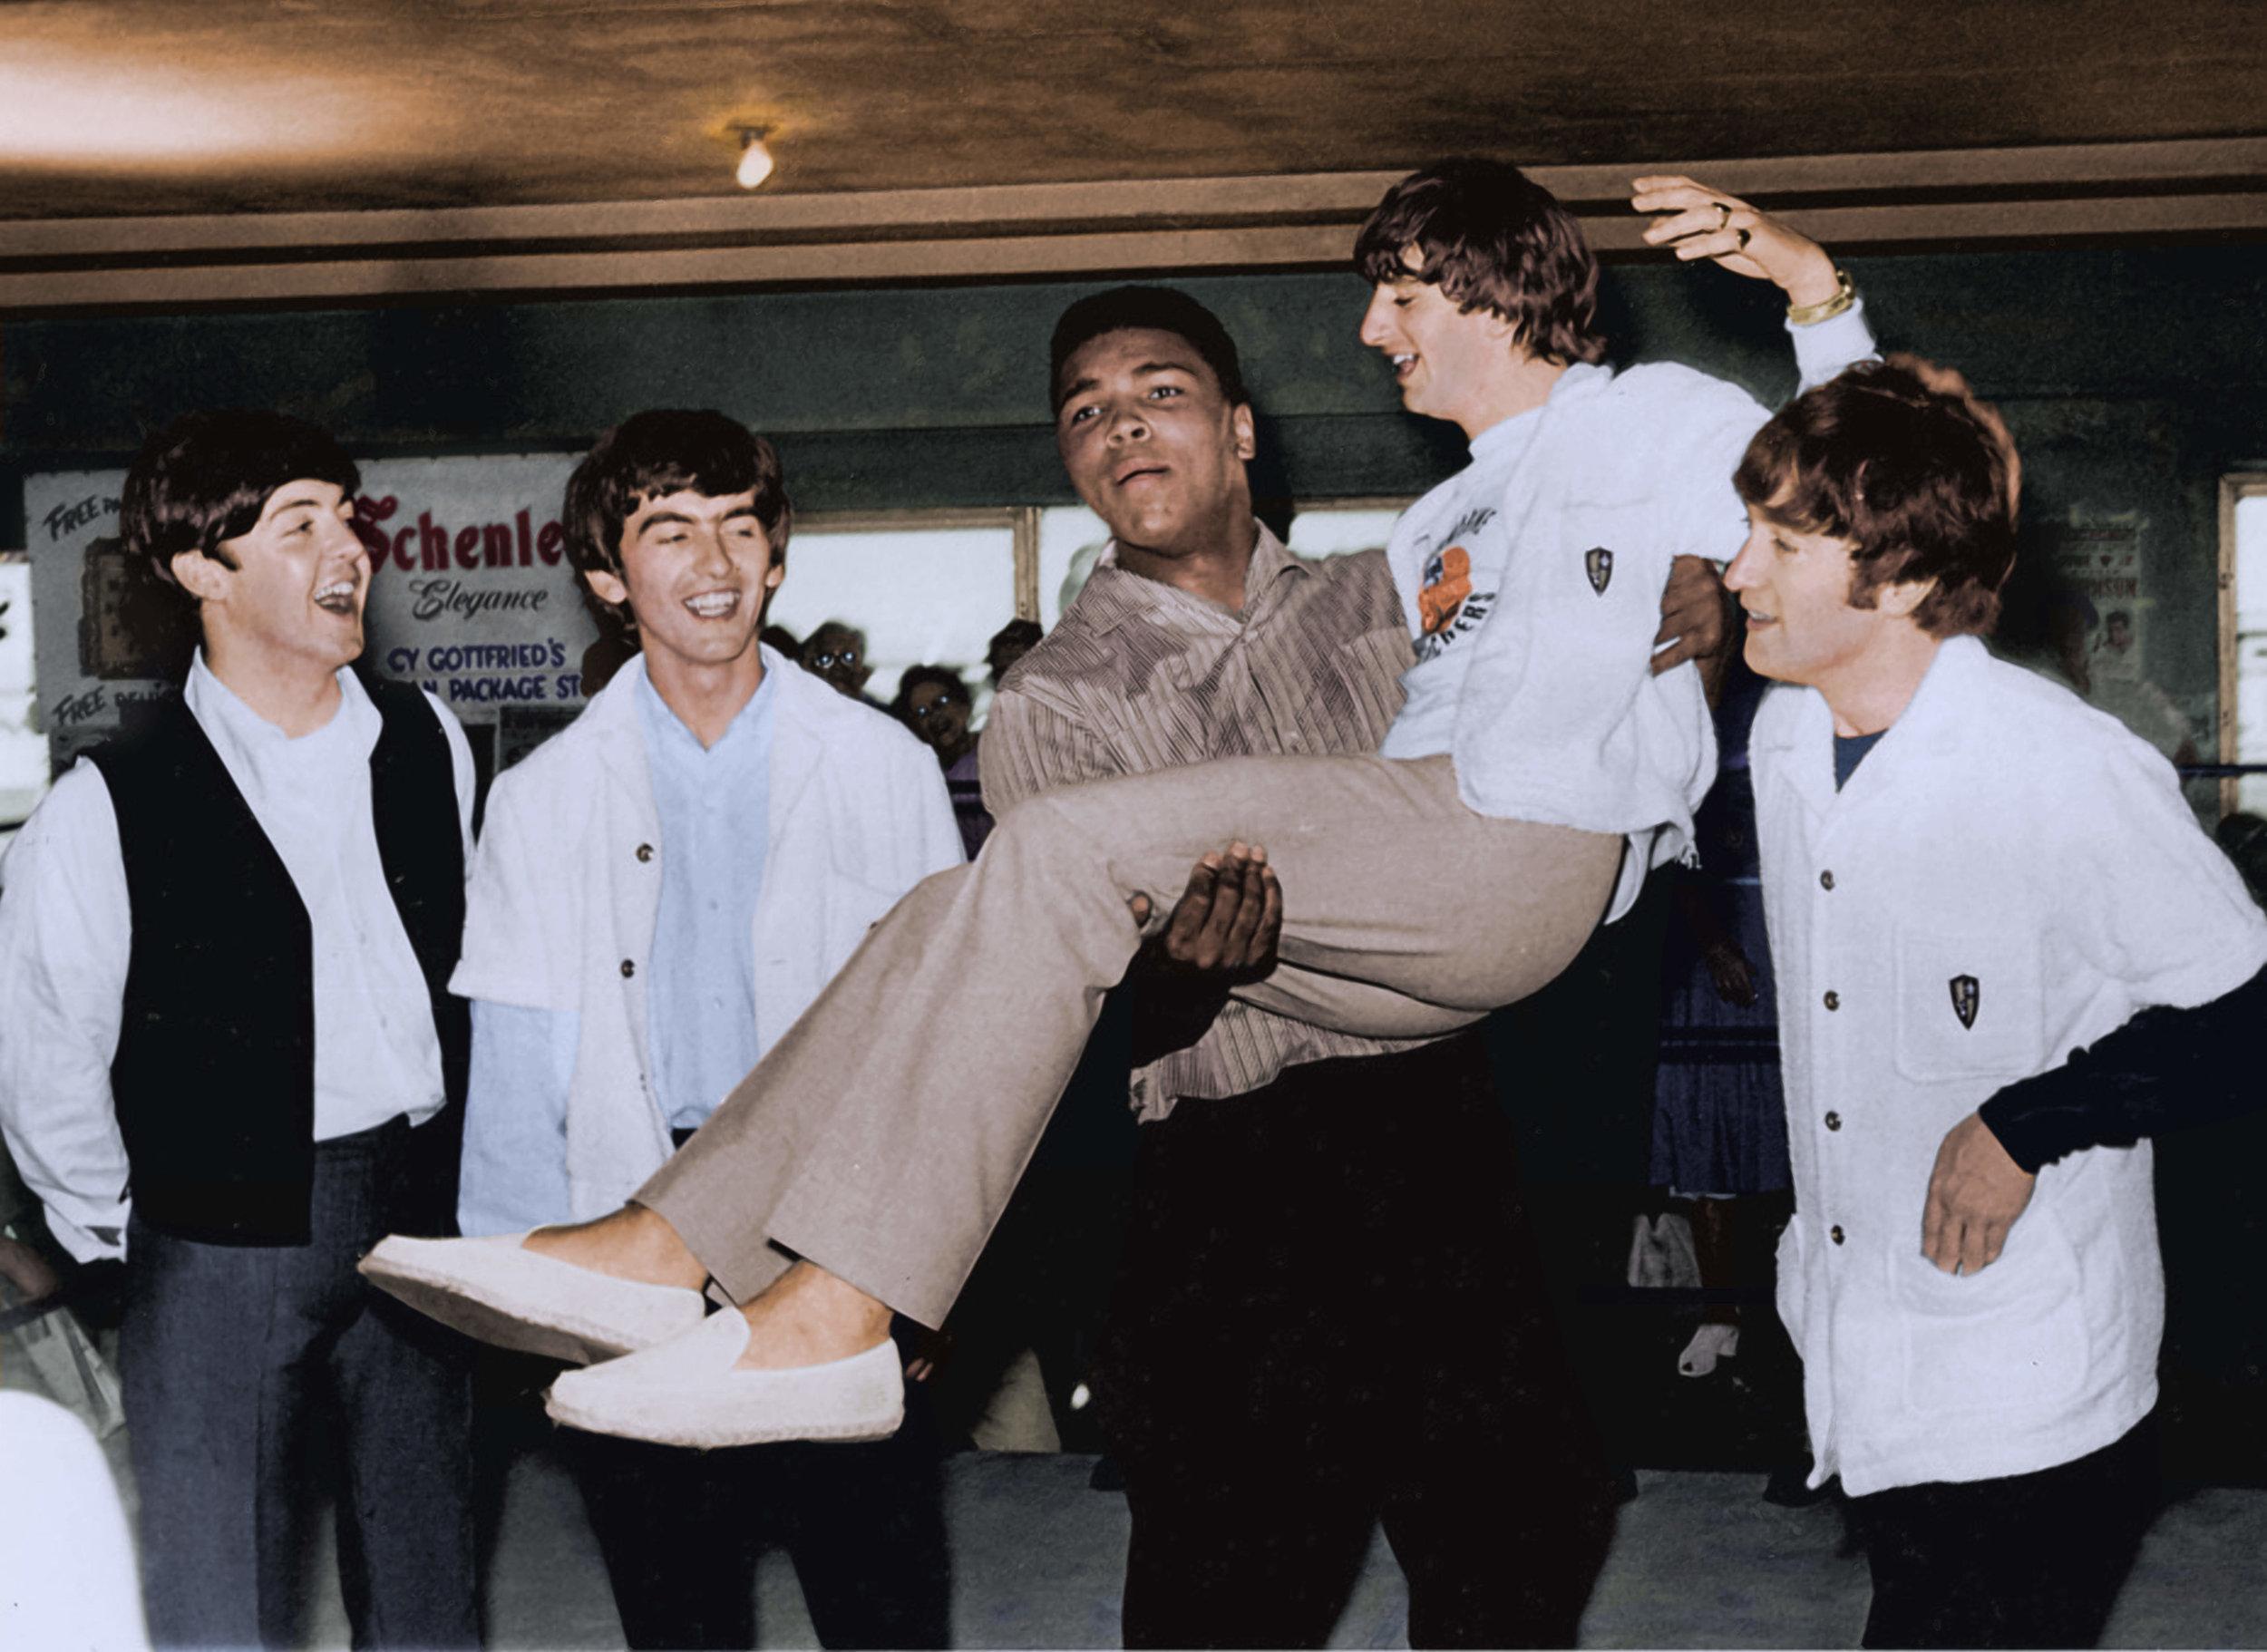 Ali and The Beatles - 07736540.jpg